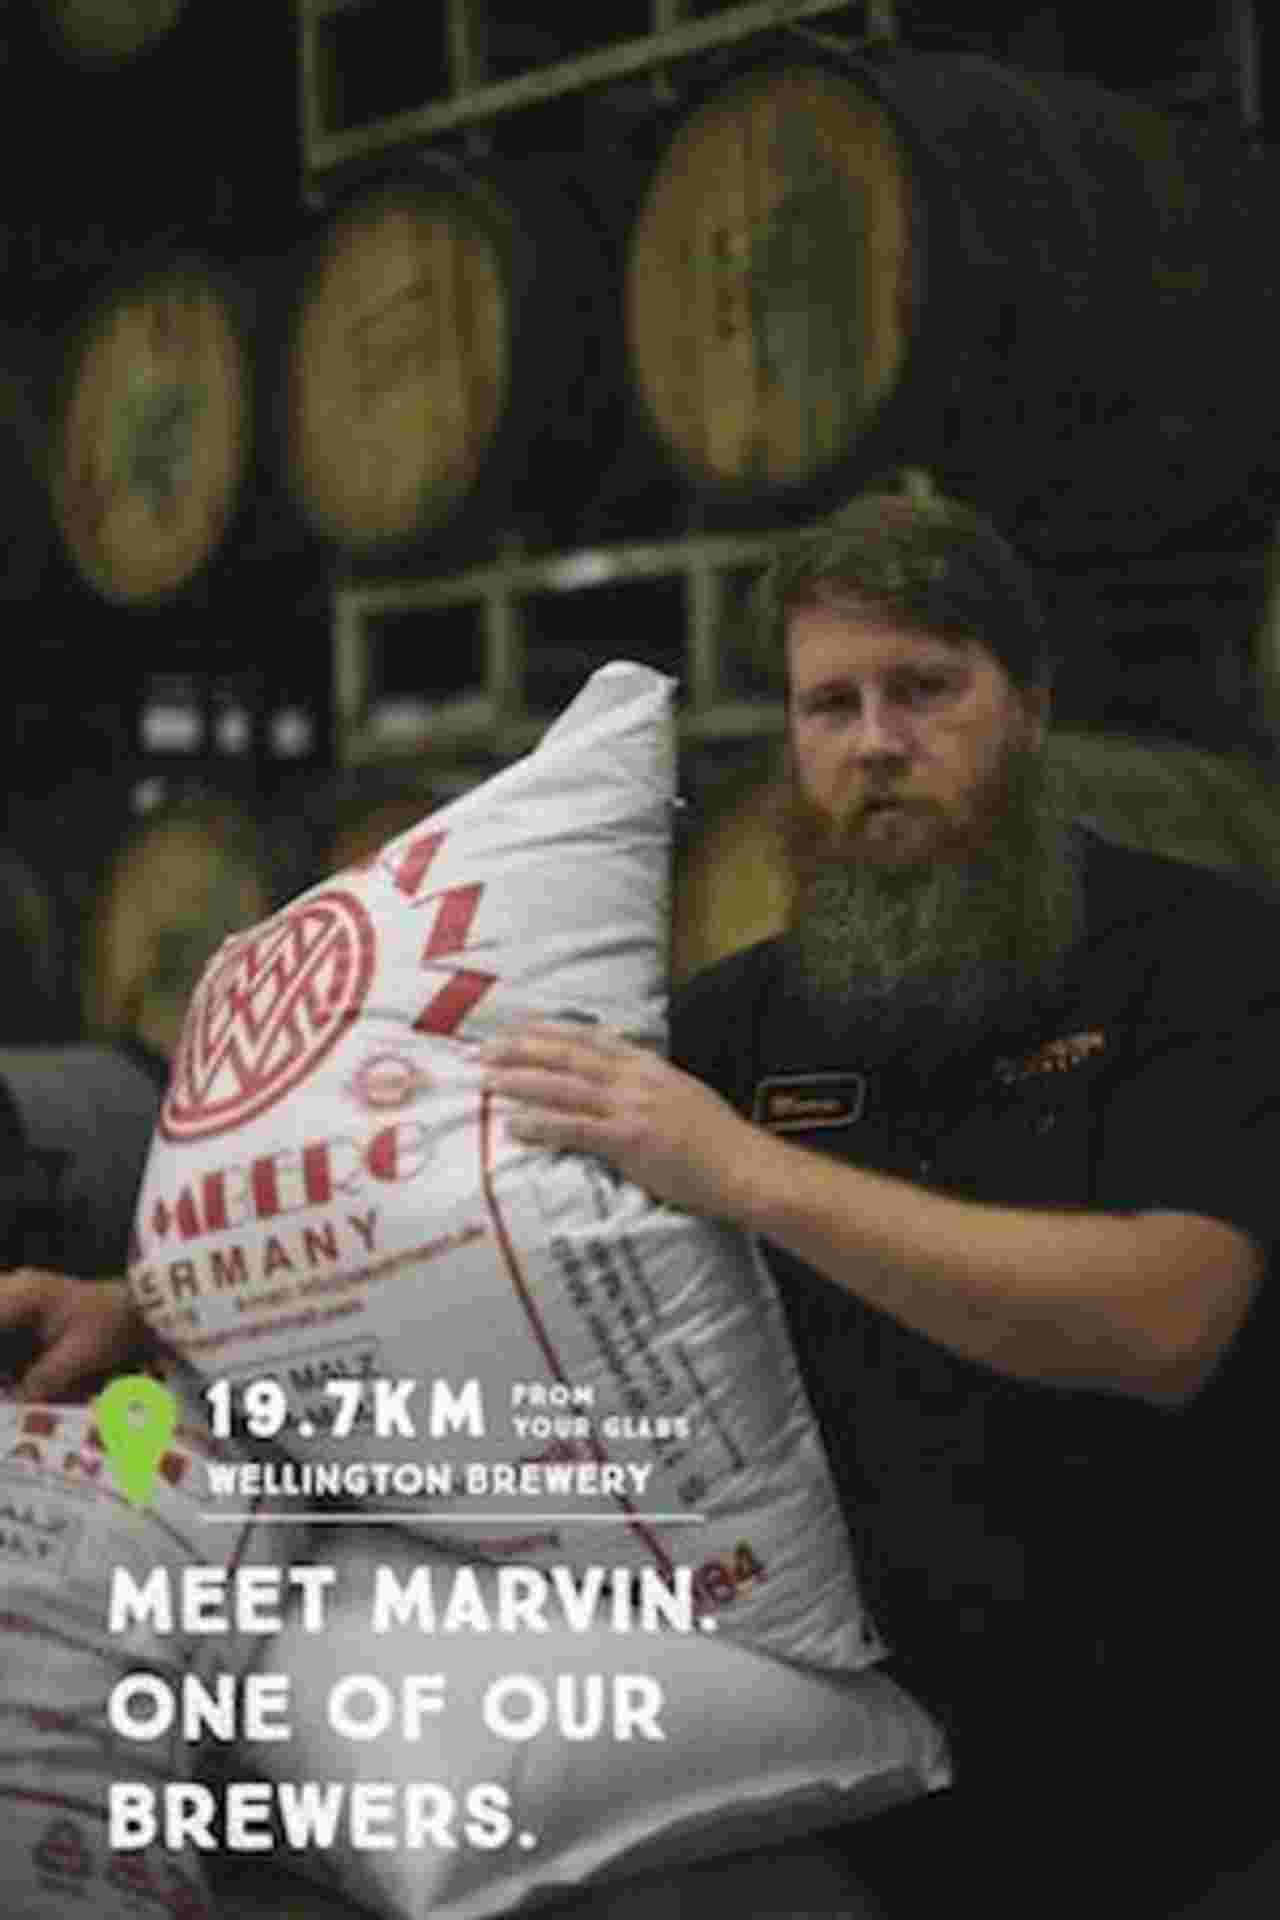 Wellington Brewery